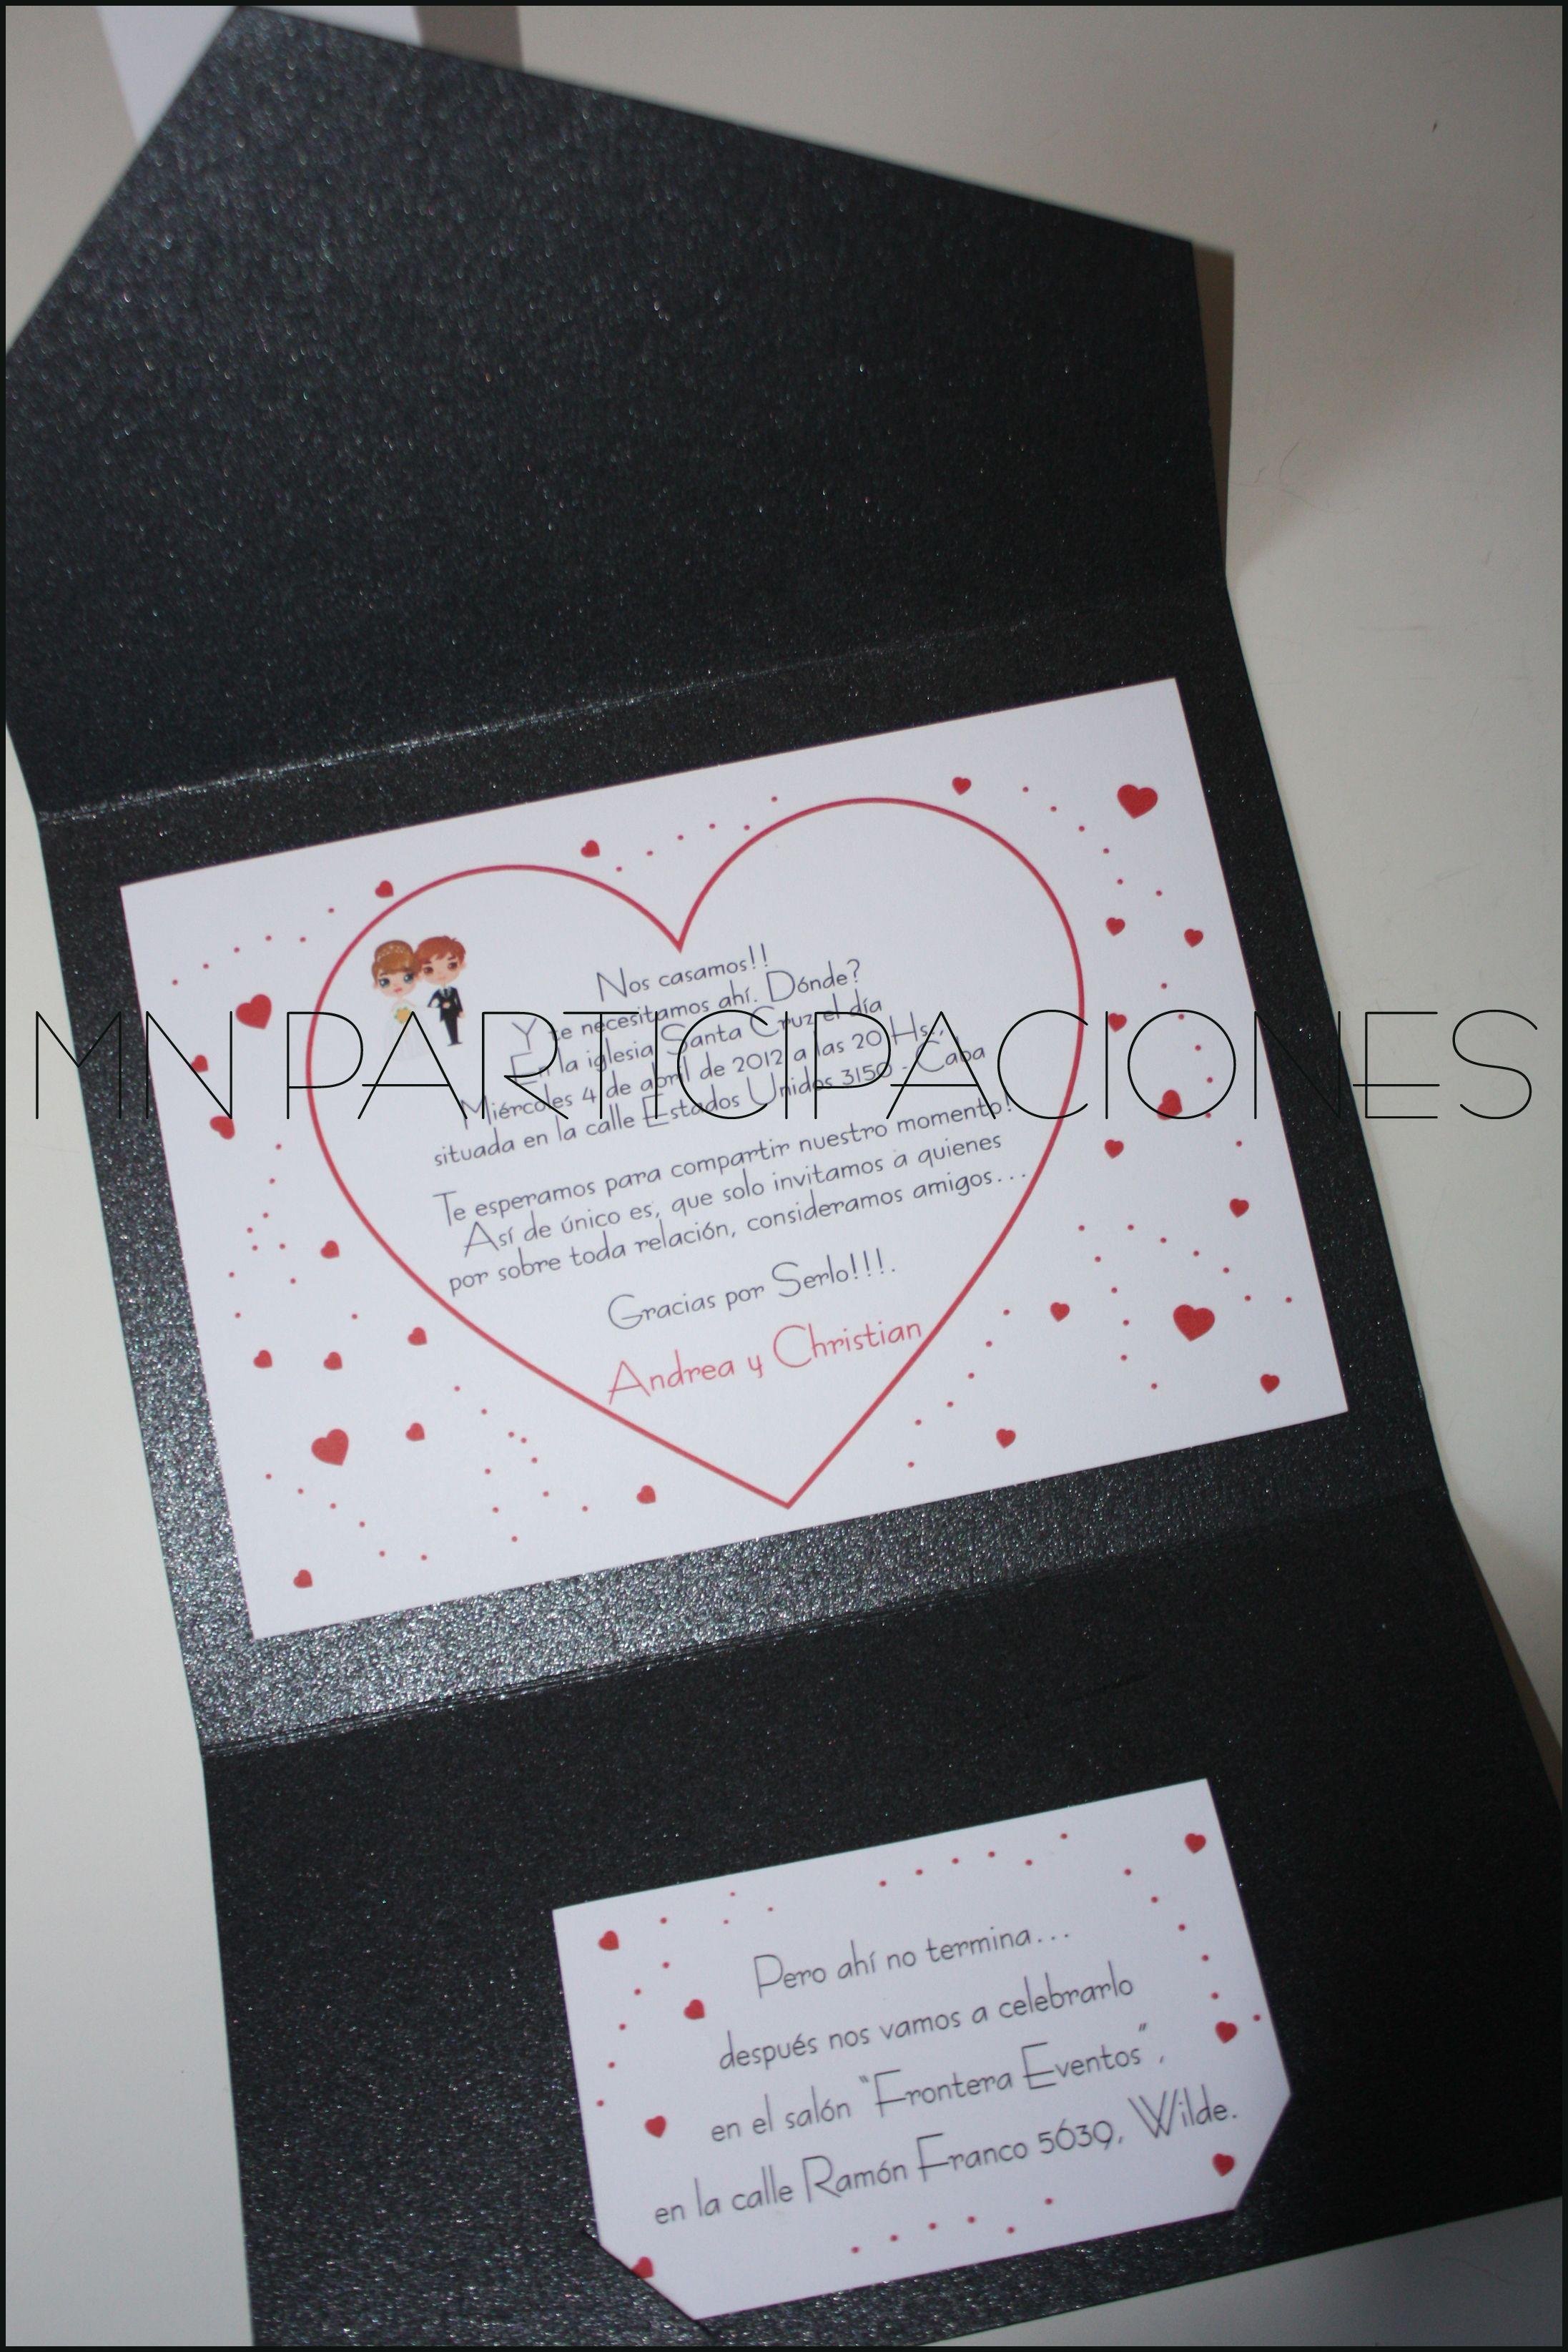 Invitaciones Casamiento | Invitaciones casamiento, Invitaciones, Casamiento